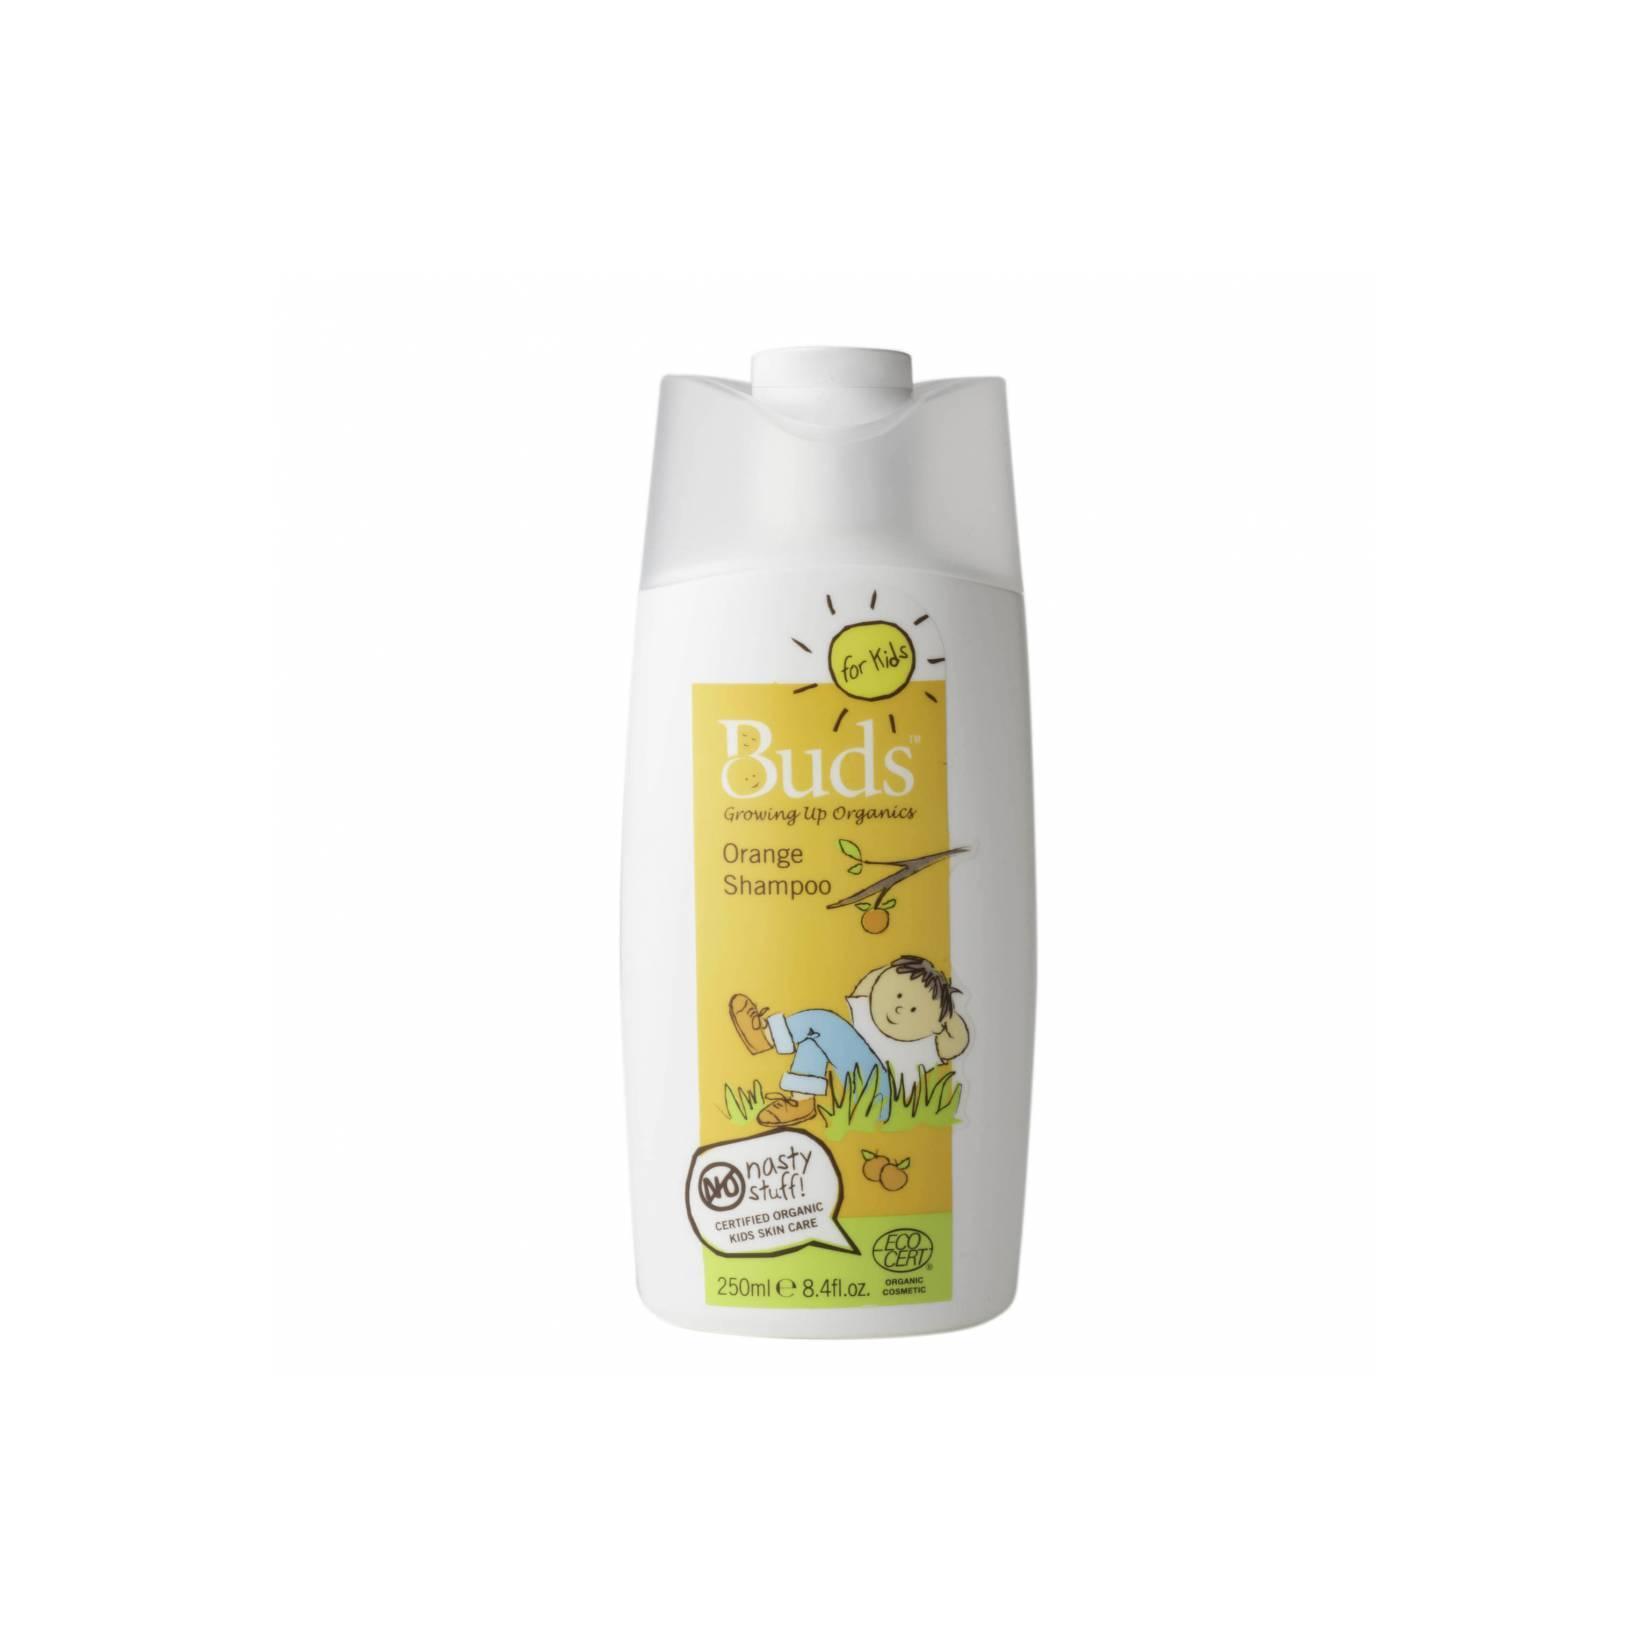 Elizzer Royal Jelly Shower Cream 250ml Daftar Harga Terbaru Source · L4472 Buds Organic Orange Shampoo